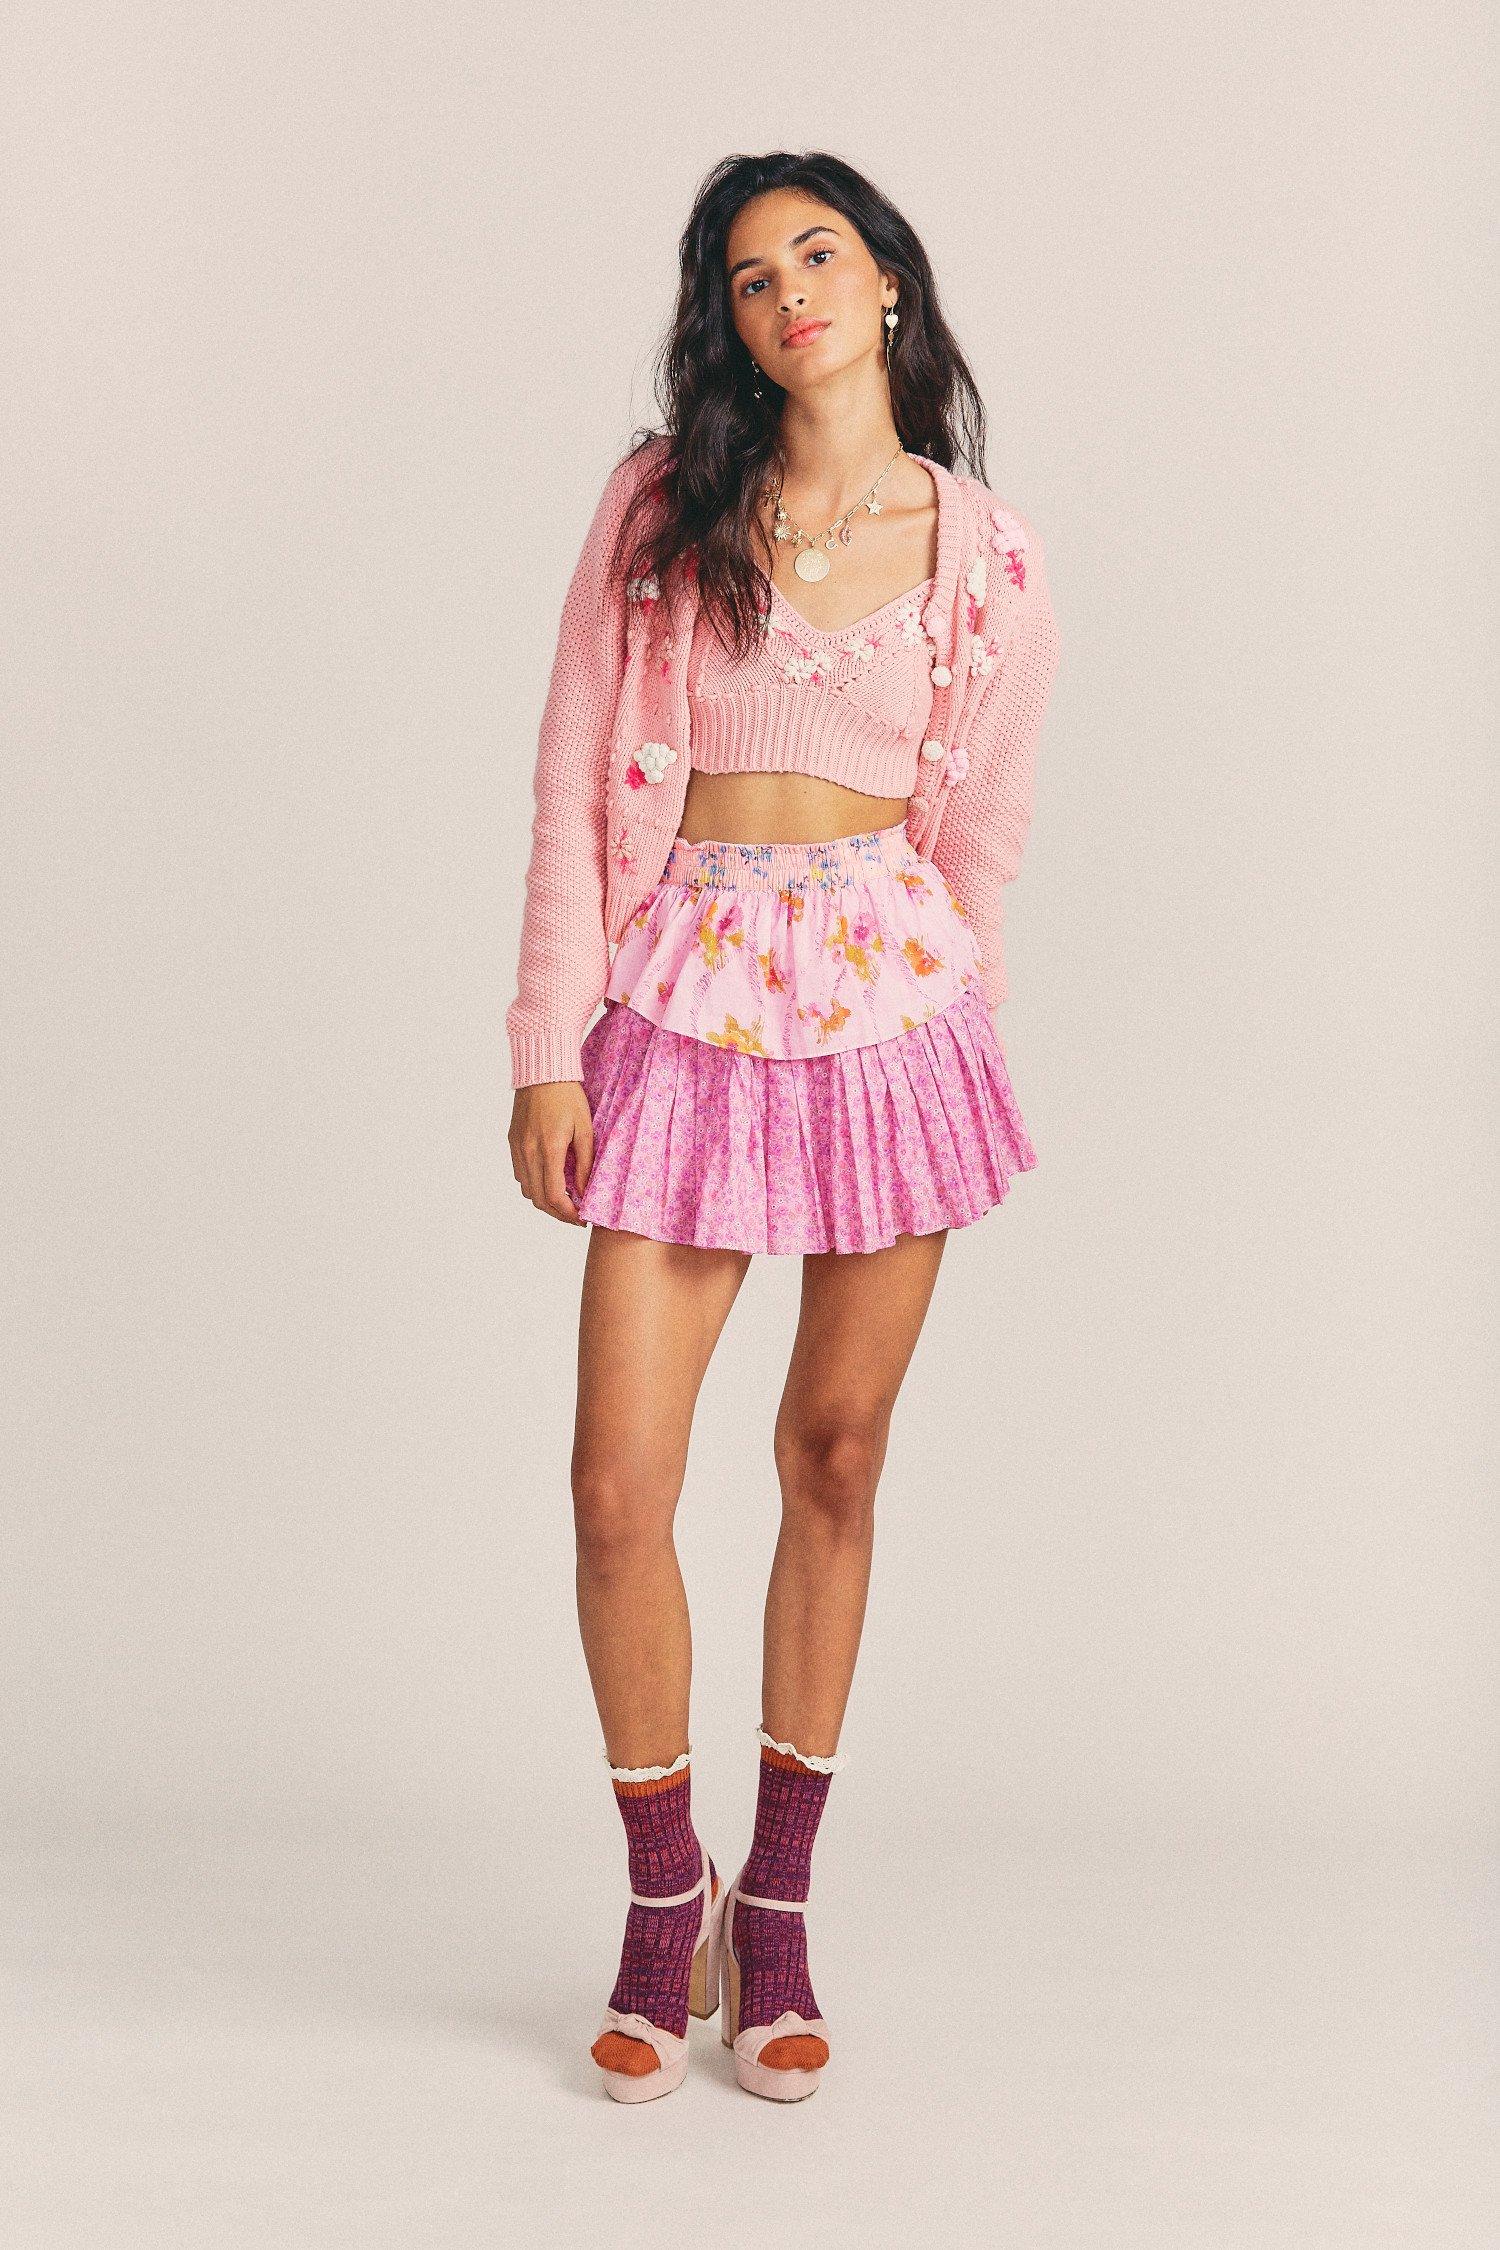 Ruffle-Mini-Skirt-Exploded-Pink-1